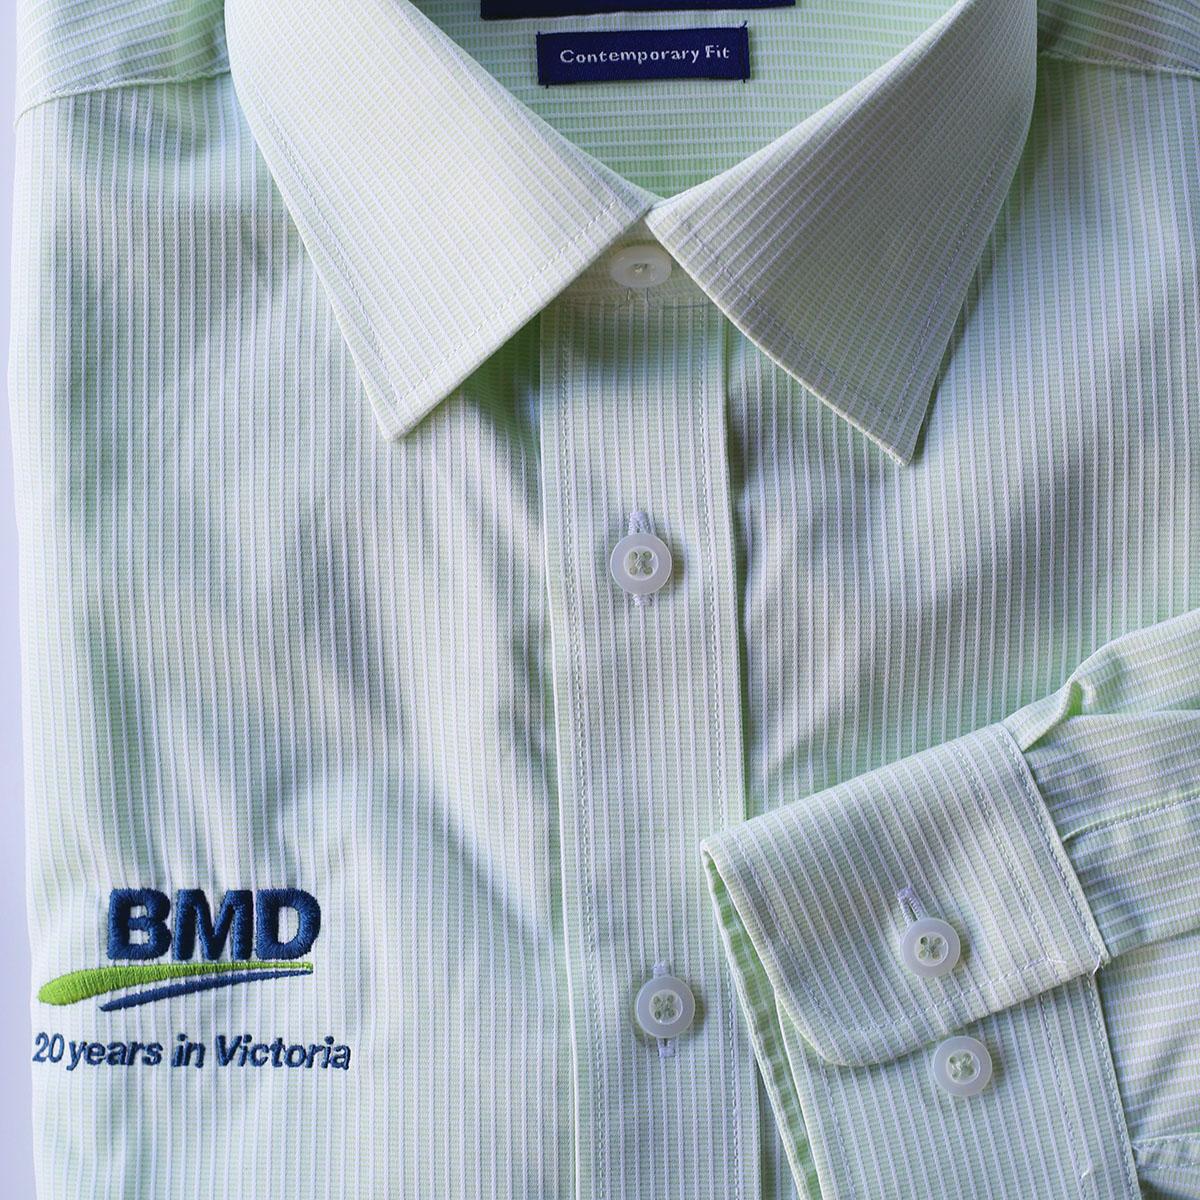 BMD_20years shirt 1200x1200_2.jpg